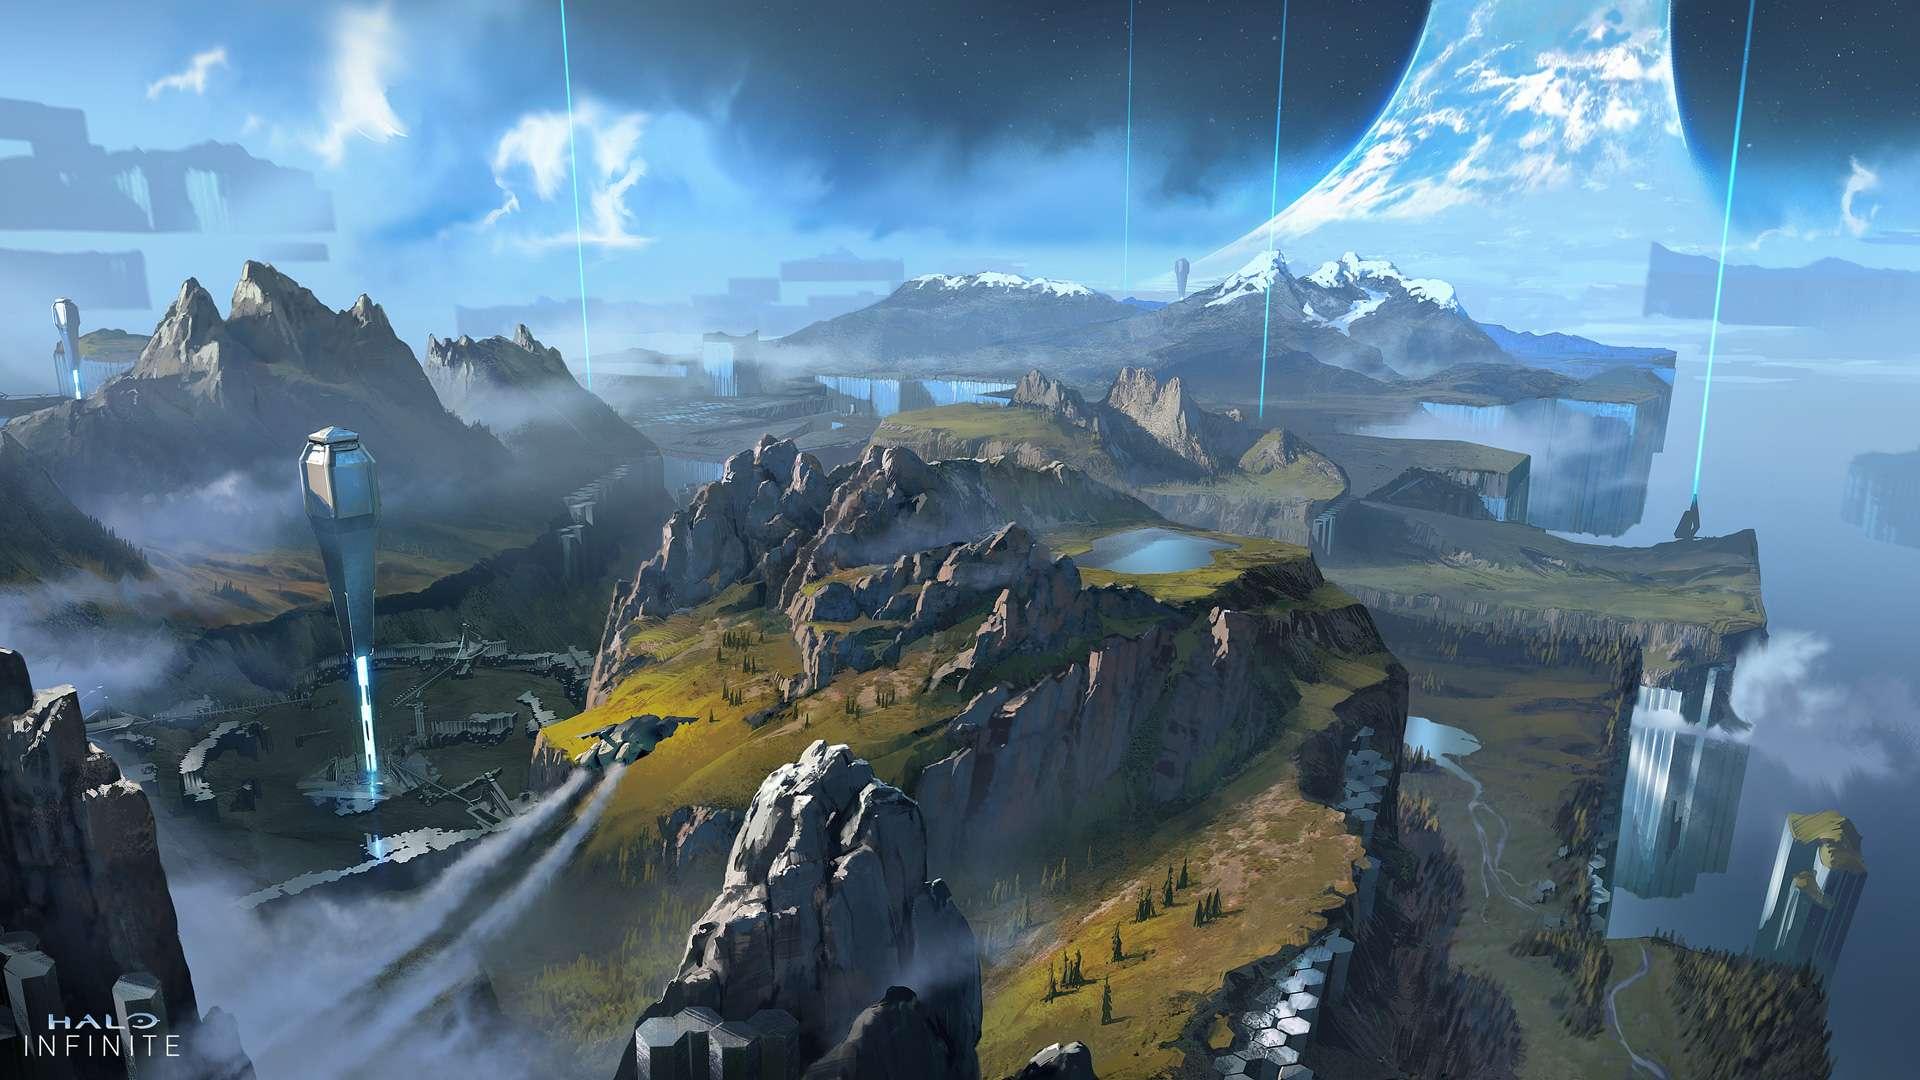 Halo Infinite Xbox Game Showcase Anteprima